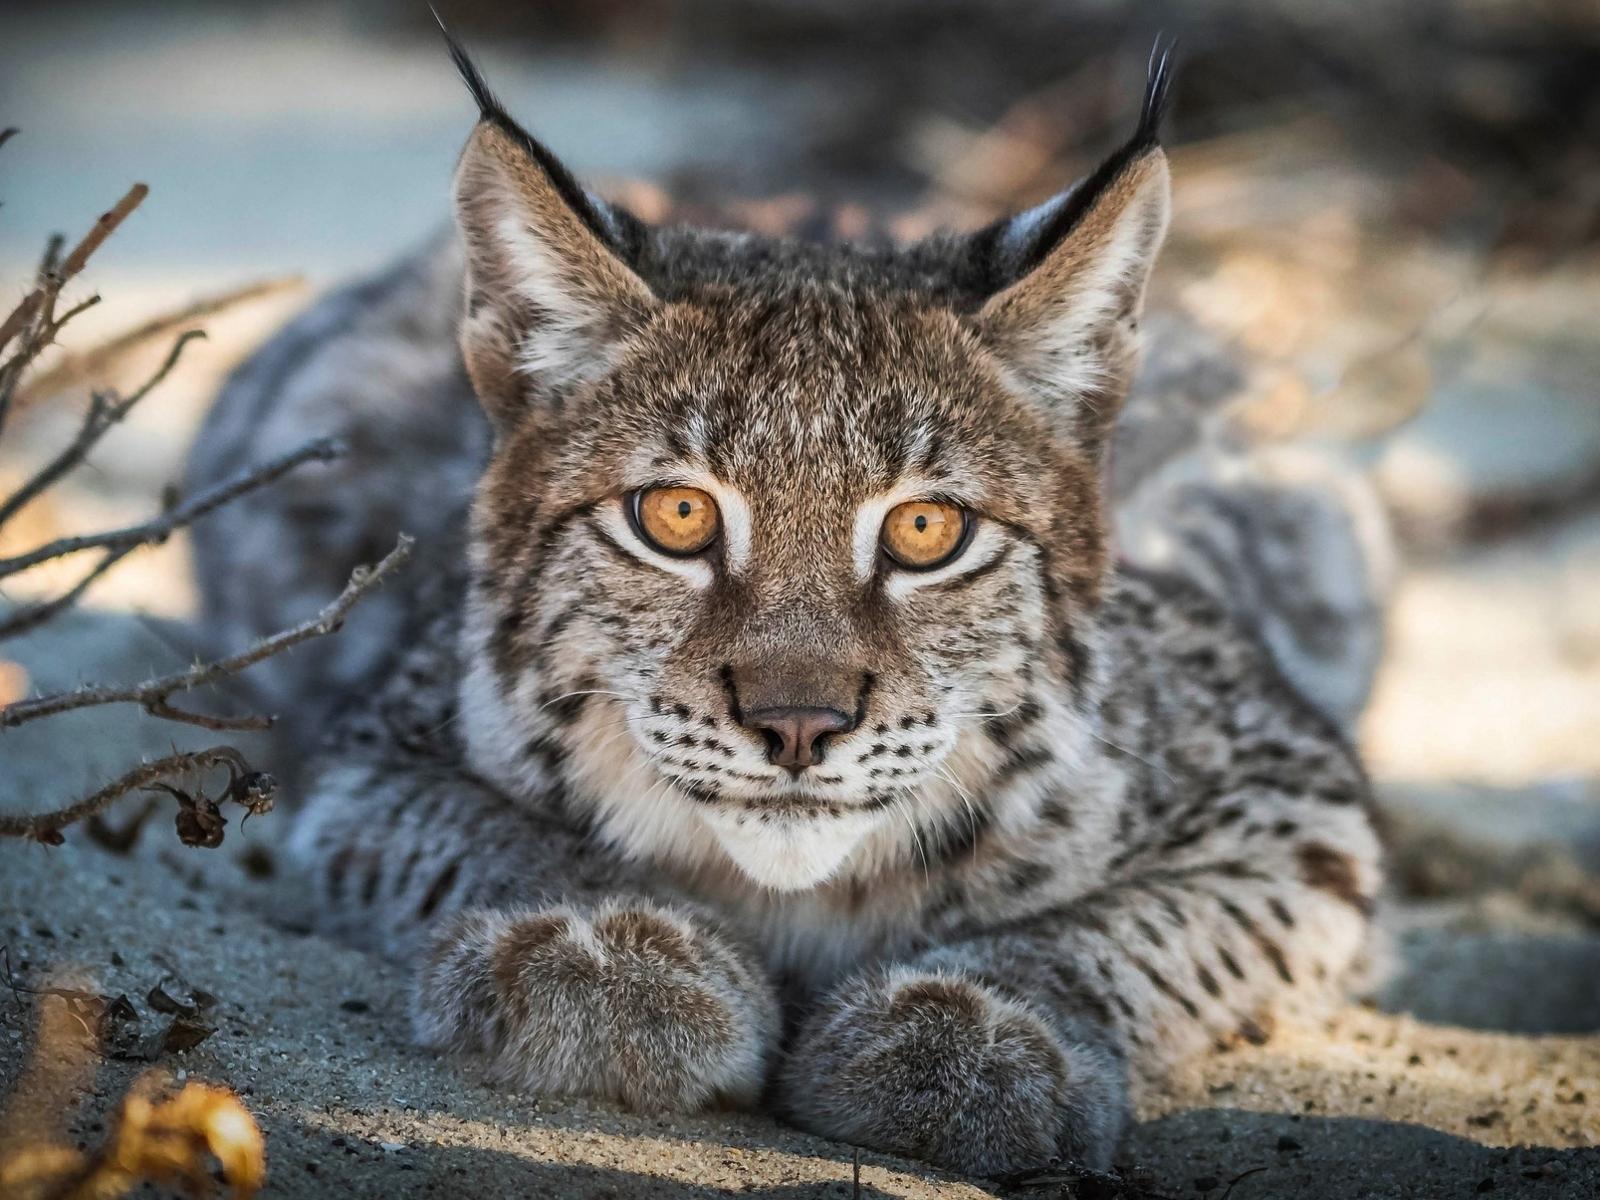 Close up, Lynx, cat, predator, muzzle, 1600x1200 wallpaper